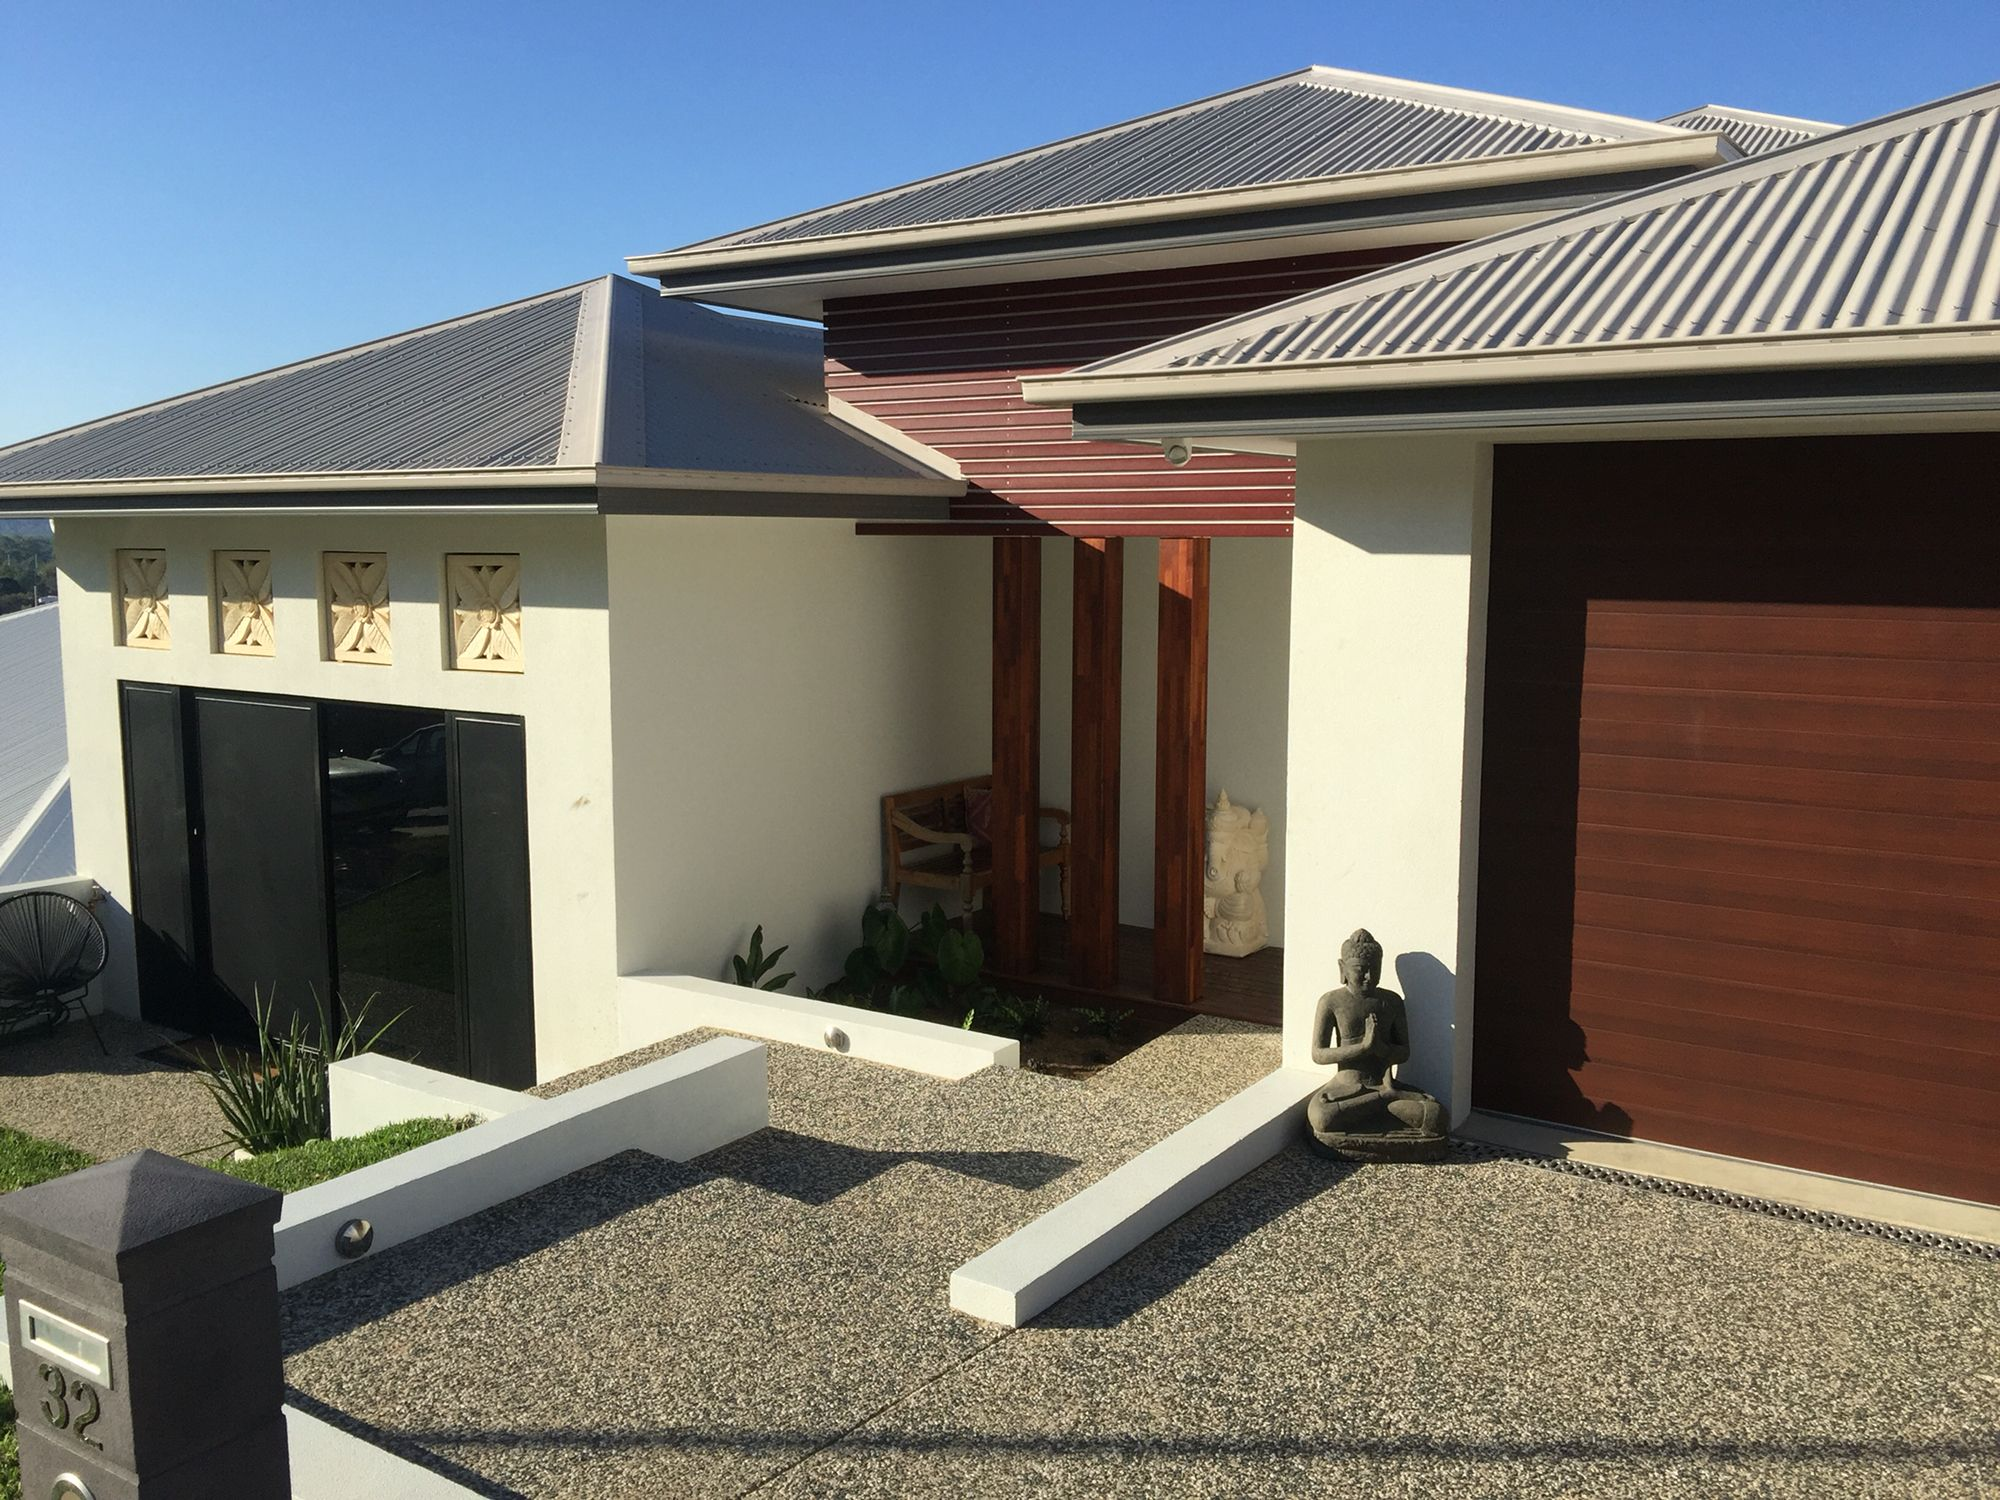 House Colours Colorbond Roof Gutters Dune Facias Basalt Exterior Walls Surfmist Garage Door